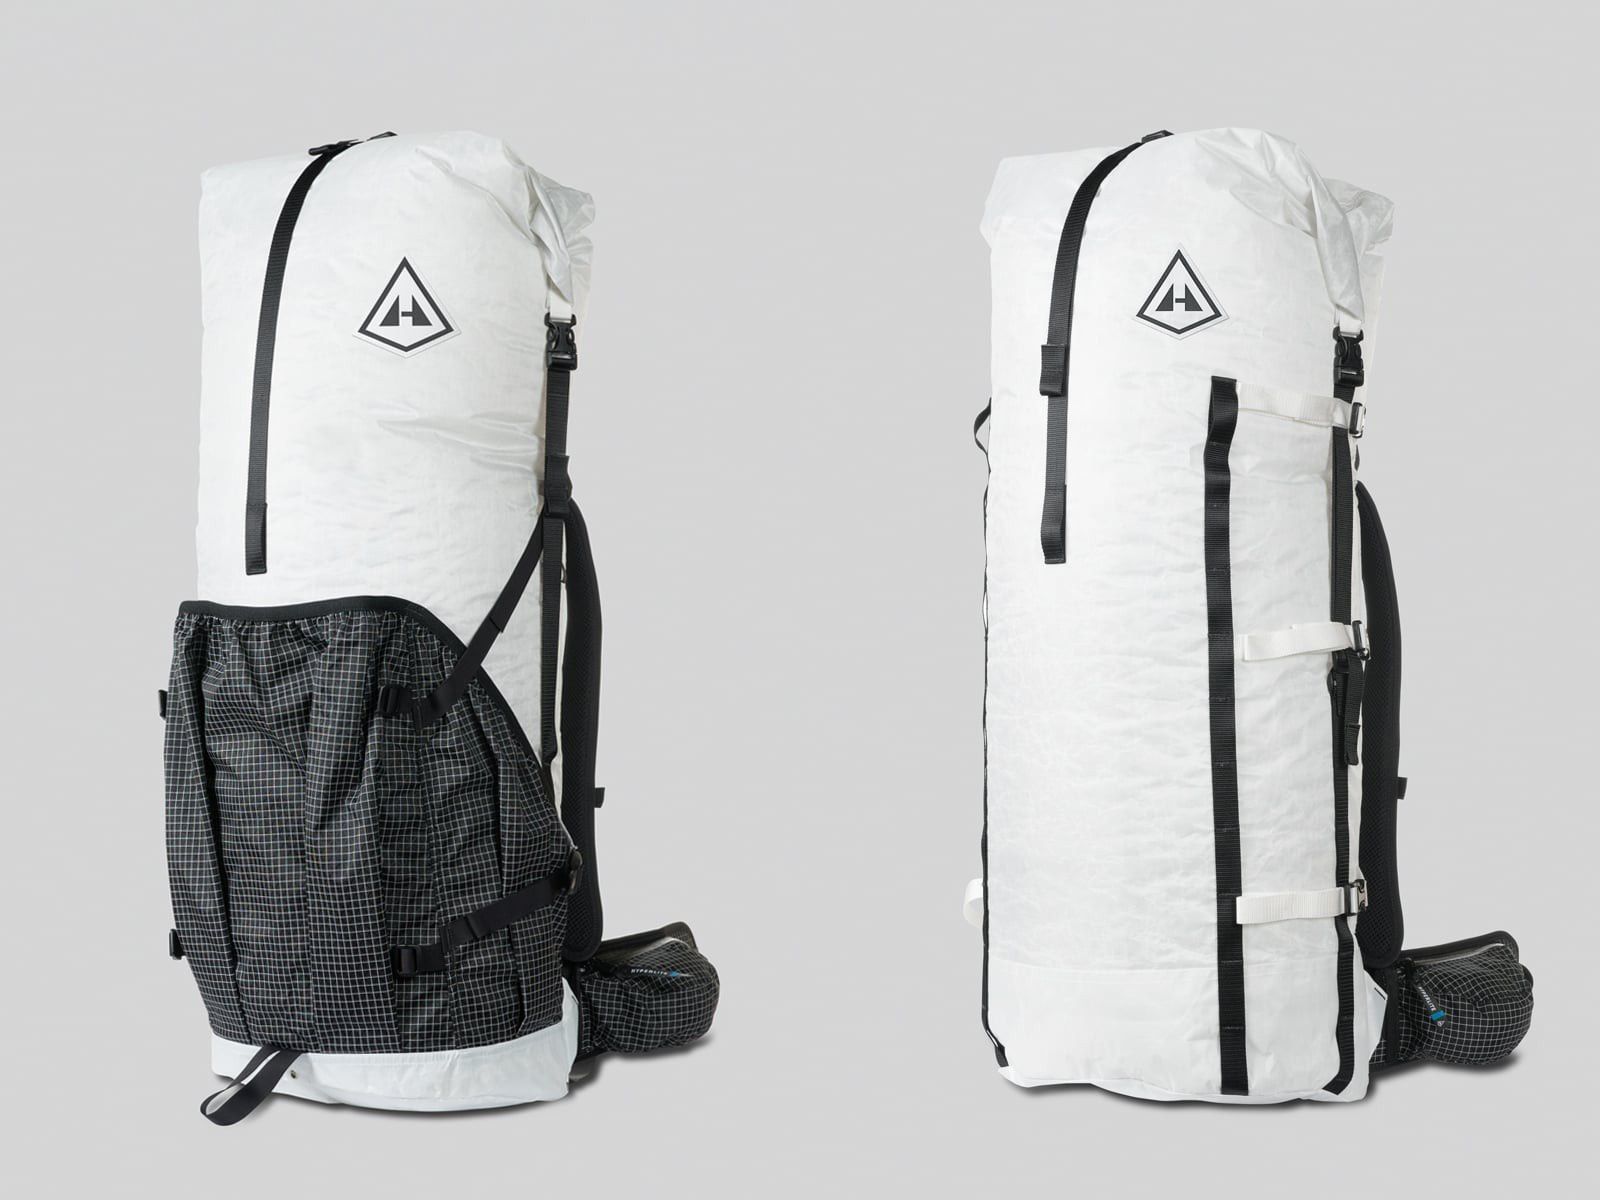 Hyperlite Mountain Gear Ultralight Backpack Review  Windrider ... 02843184b